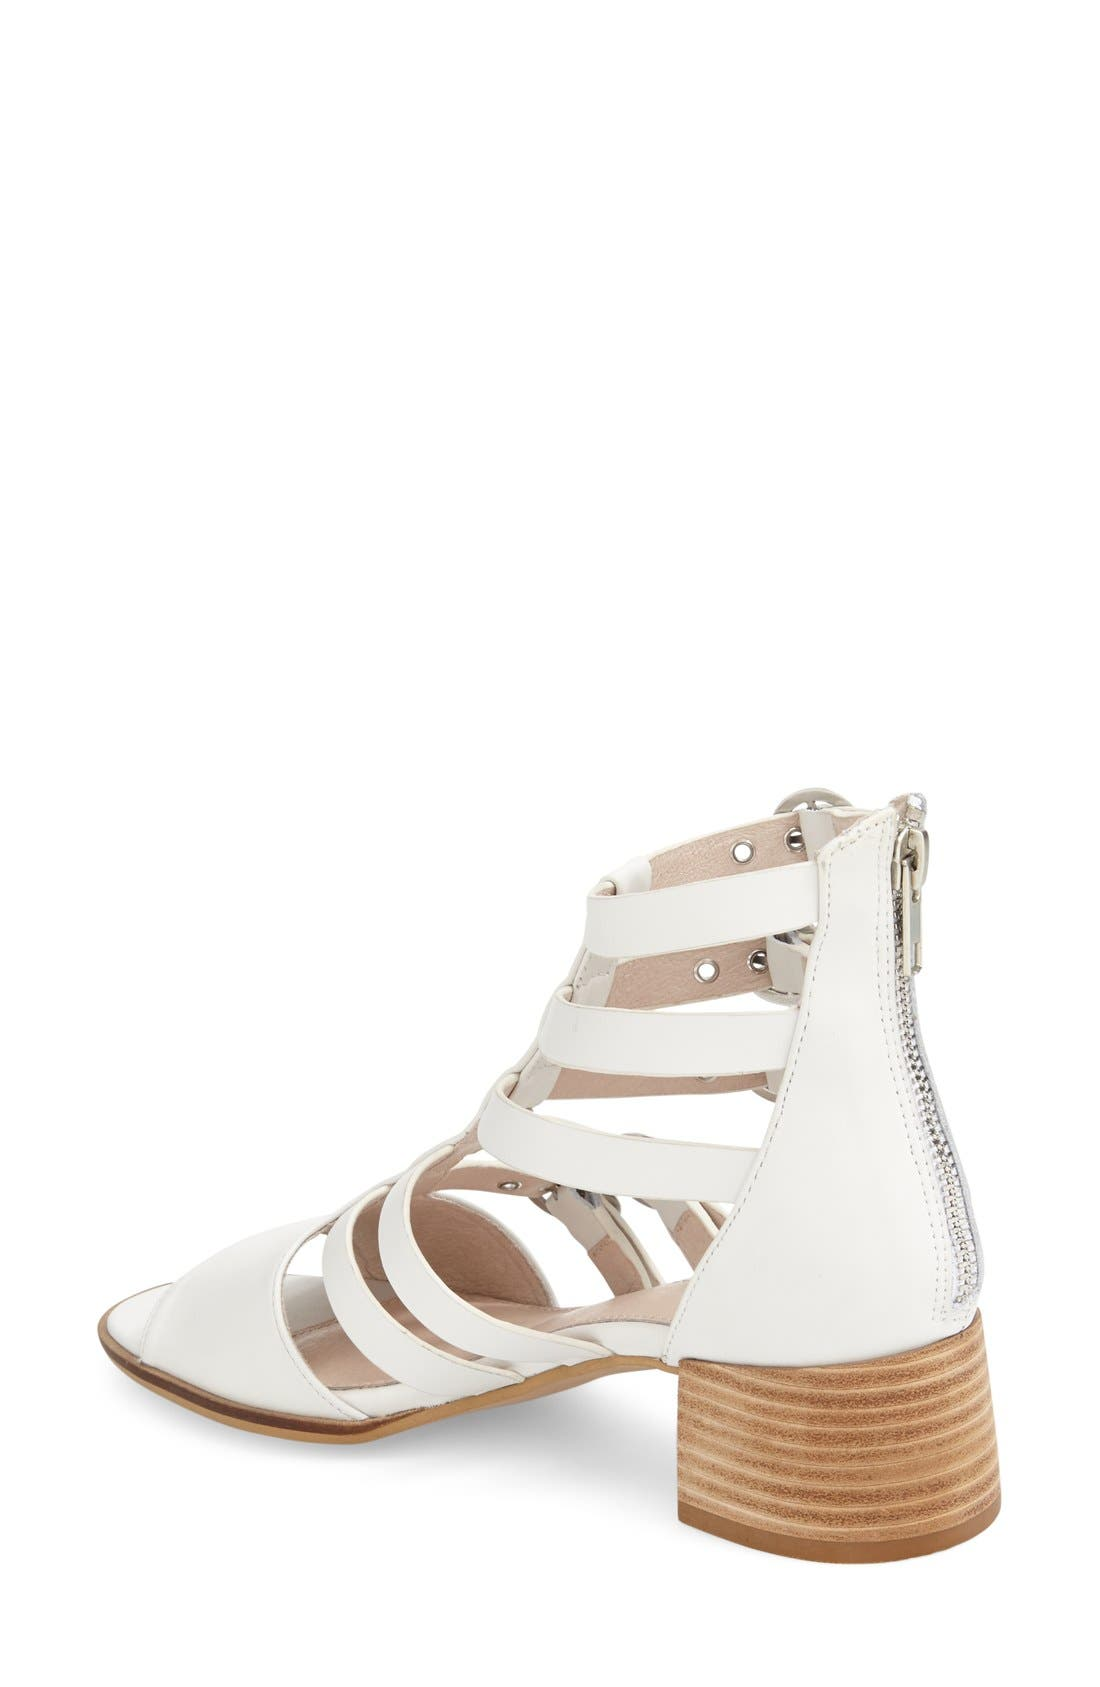 Alternate Image 2  - Shellys London 'Bea' Buckle Sandal (Women)